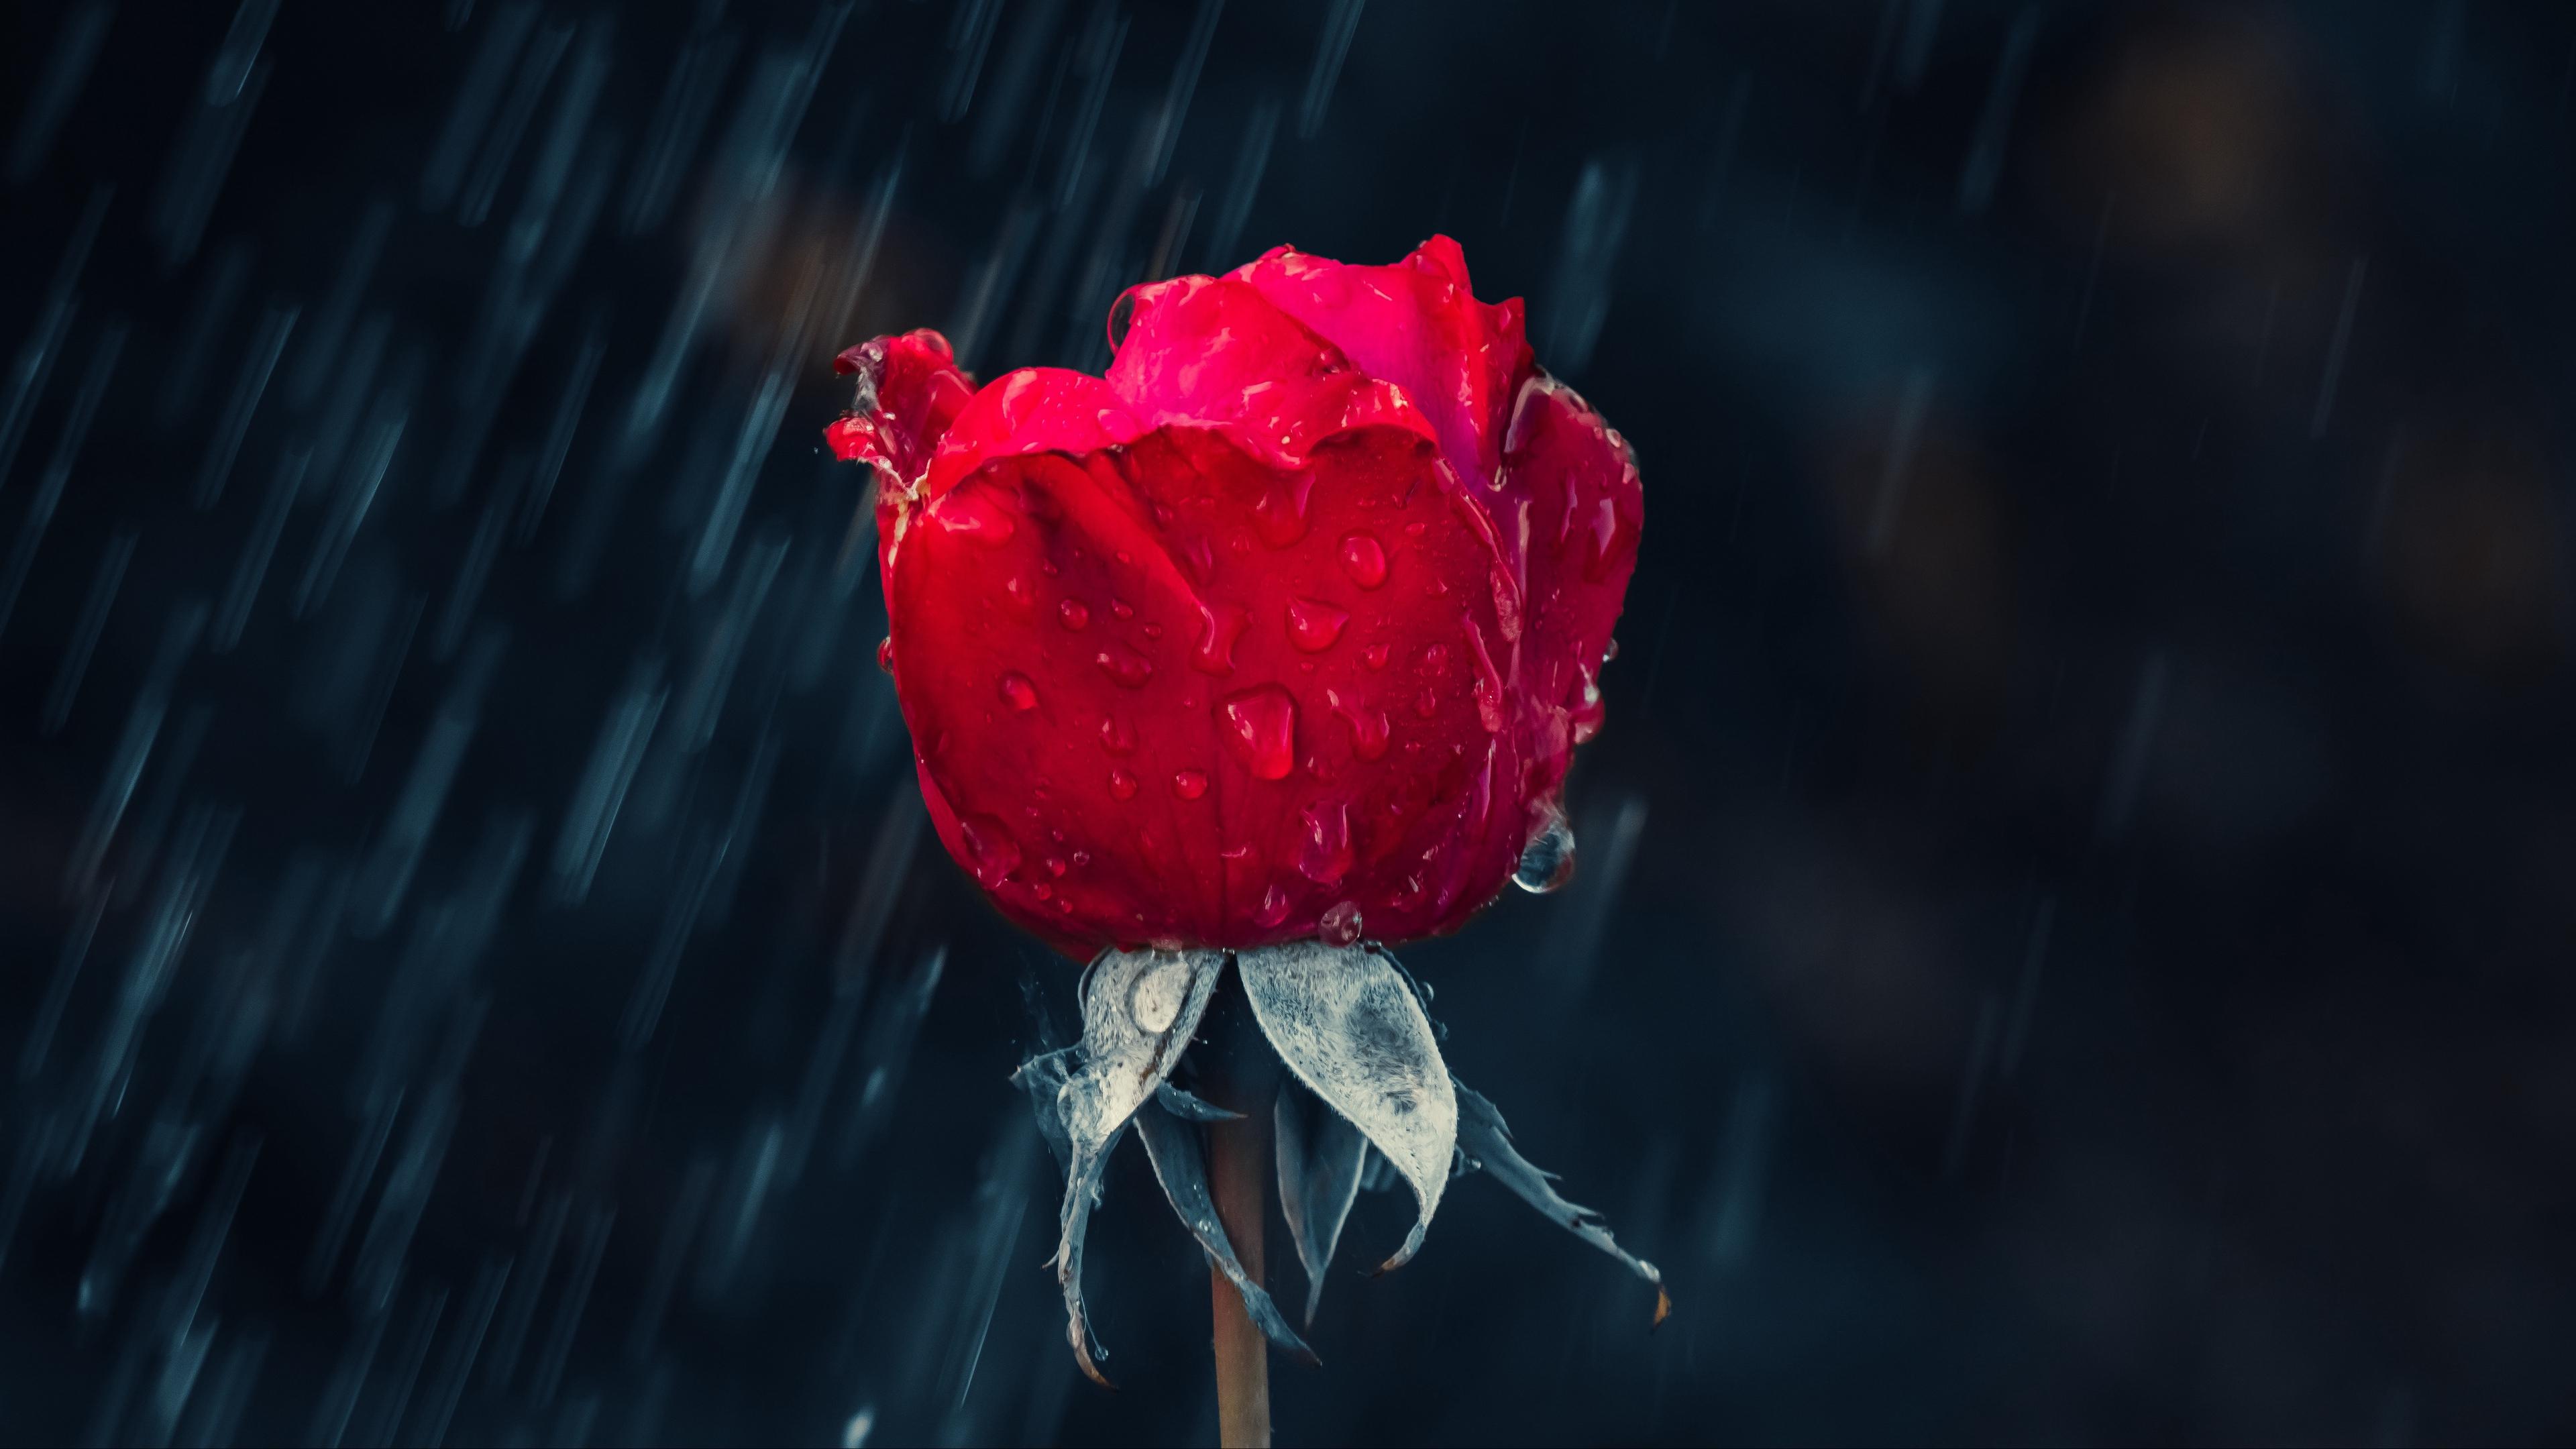 rose red bud drops rain moisture 4k 1540065145 - rose, red, bud, drops, rain, moisture 4k - Rose, red, bud